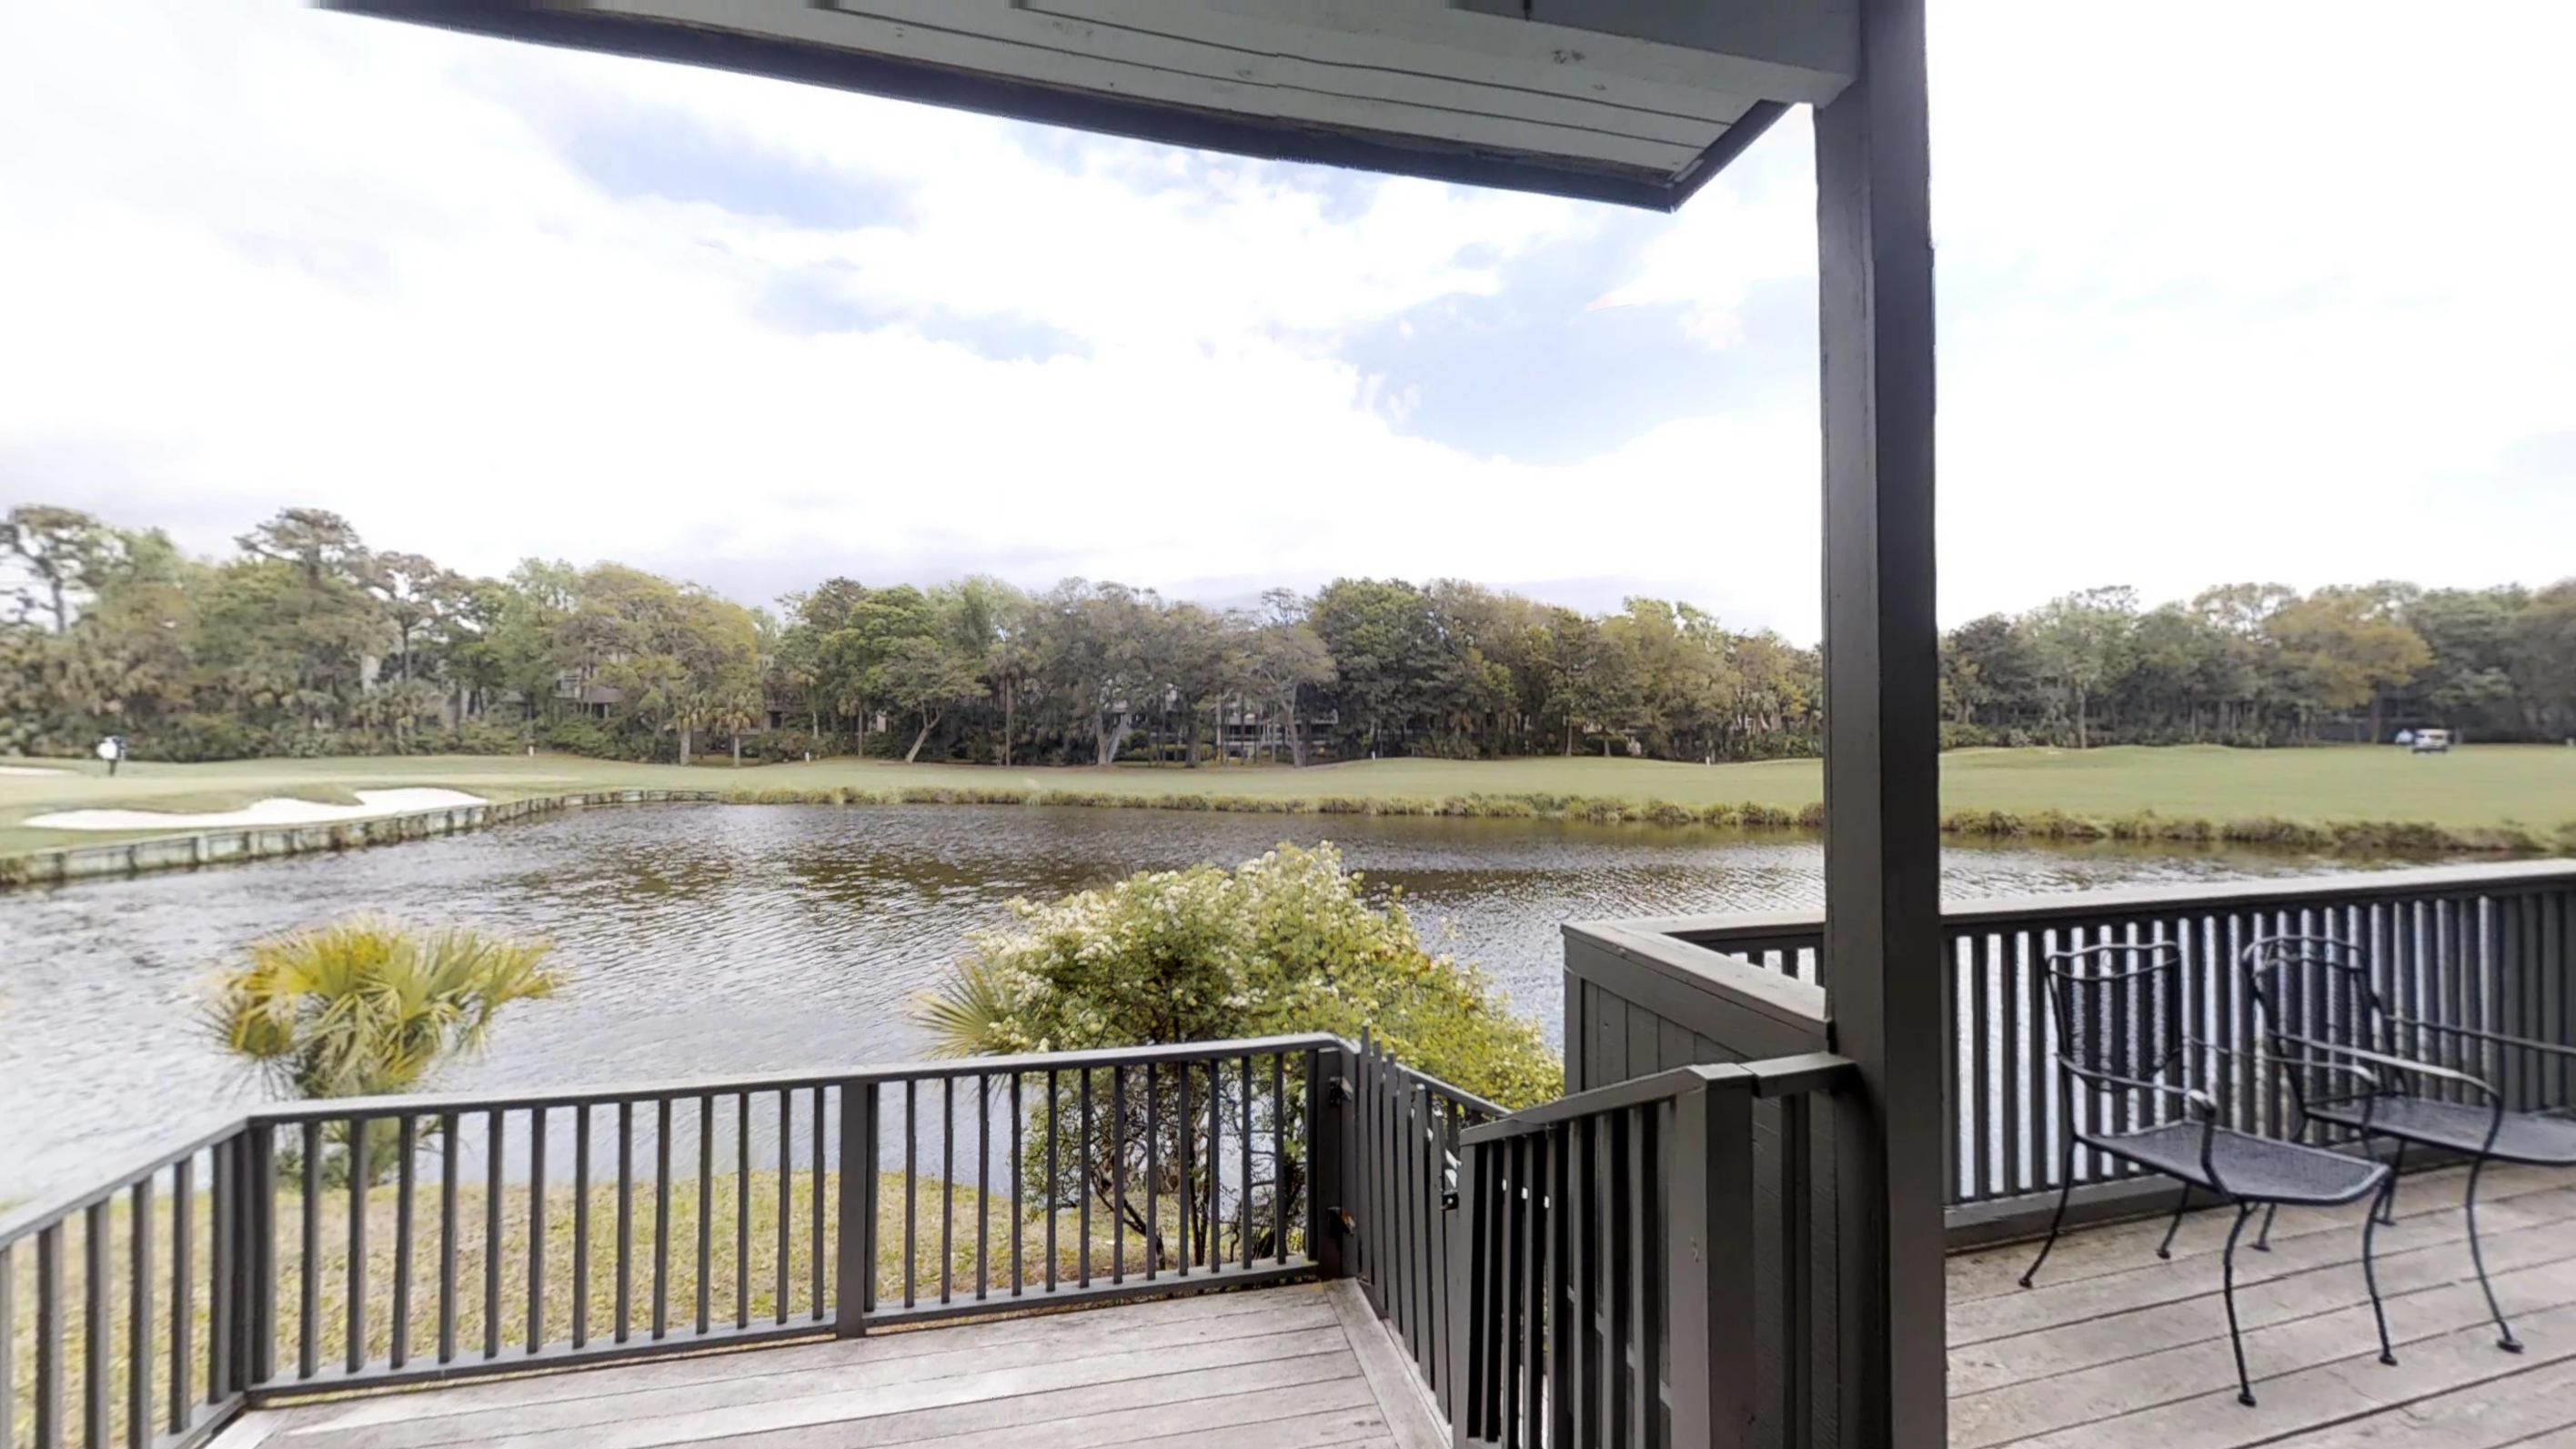 Kiawah Island Condos For Sale - 4910 Green Dolphin, Kiawah Island, SC - 27